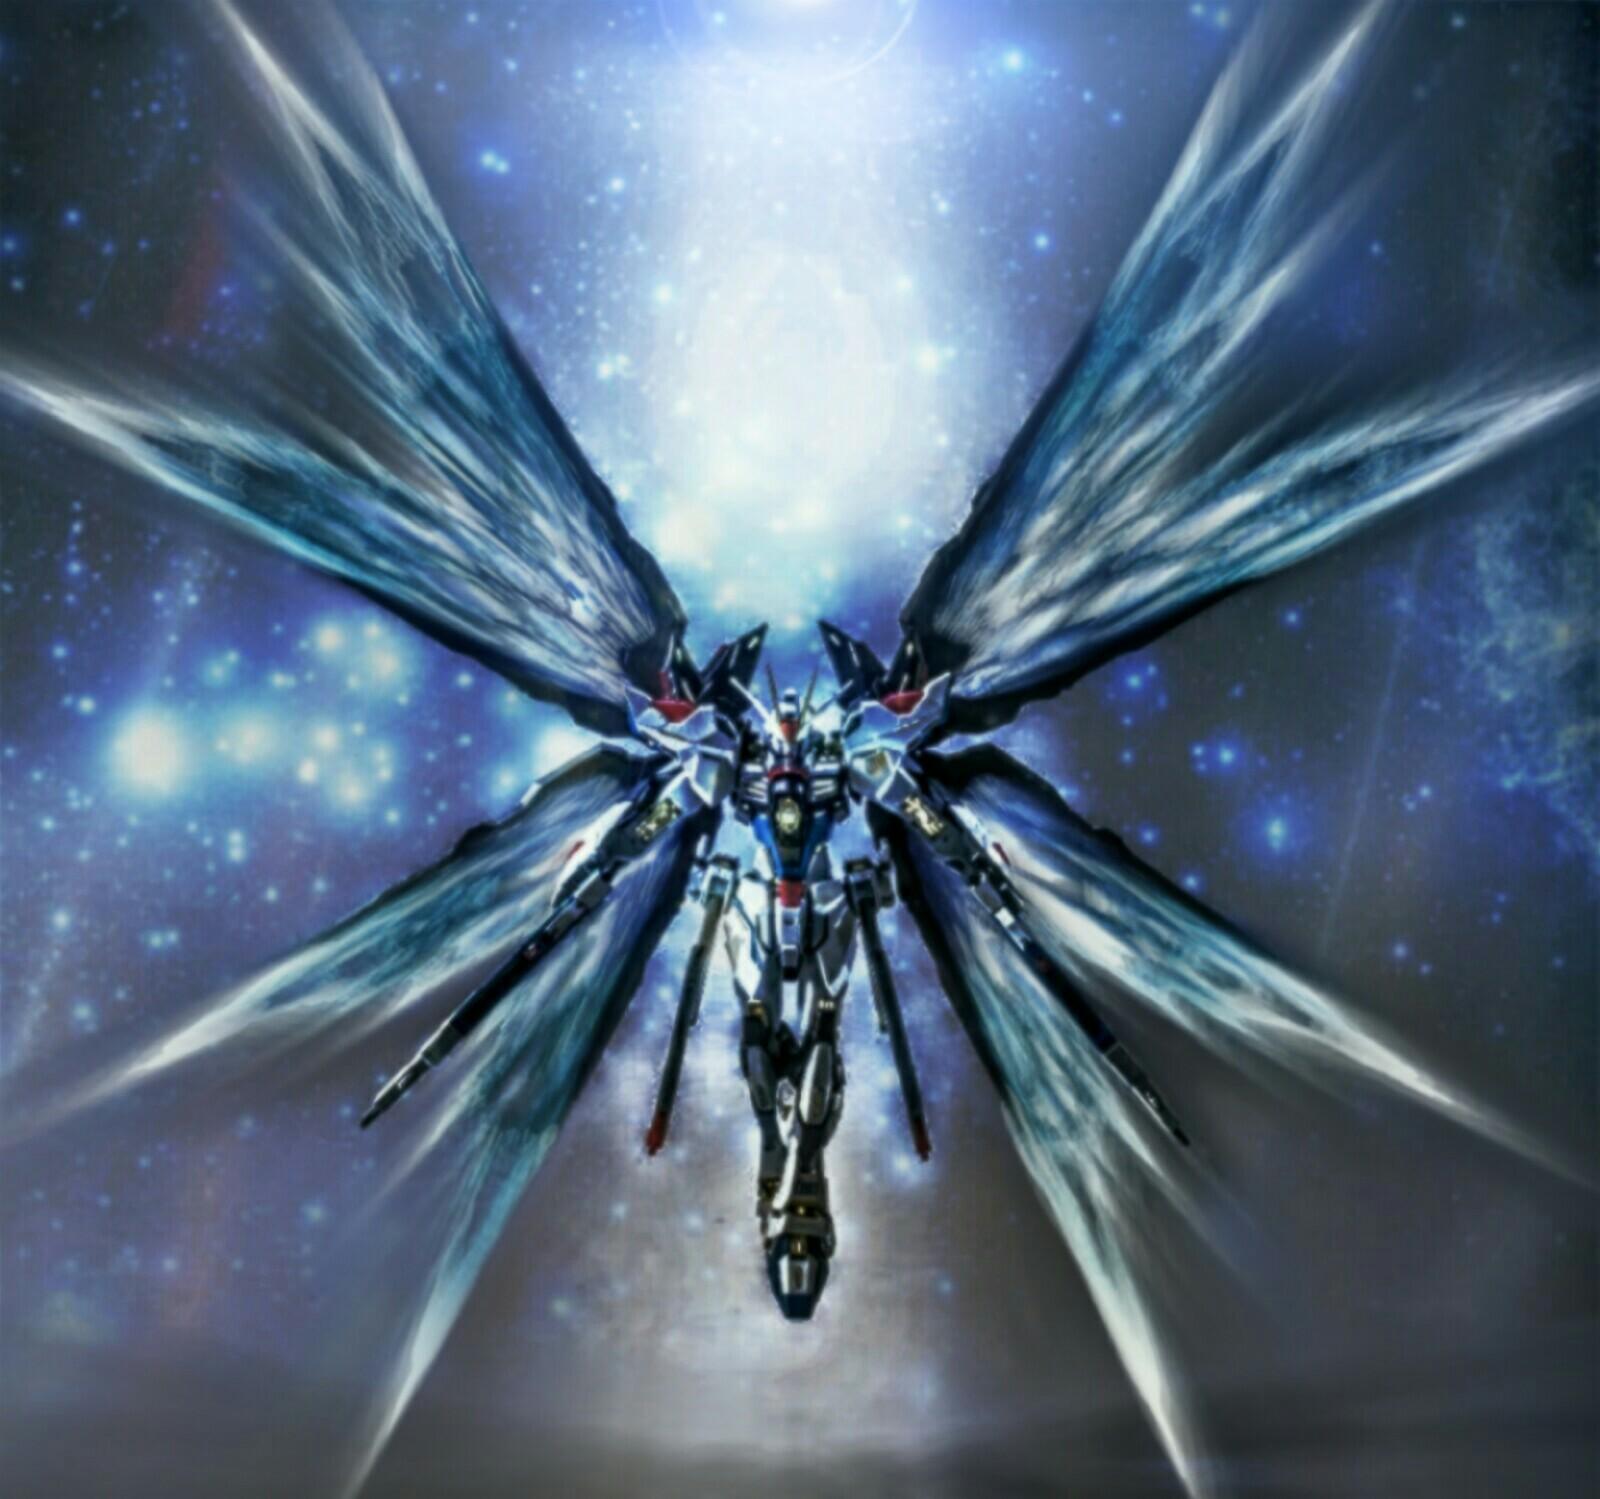 Strike Freedom Wings of Light Wallpaper by ajckh2